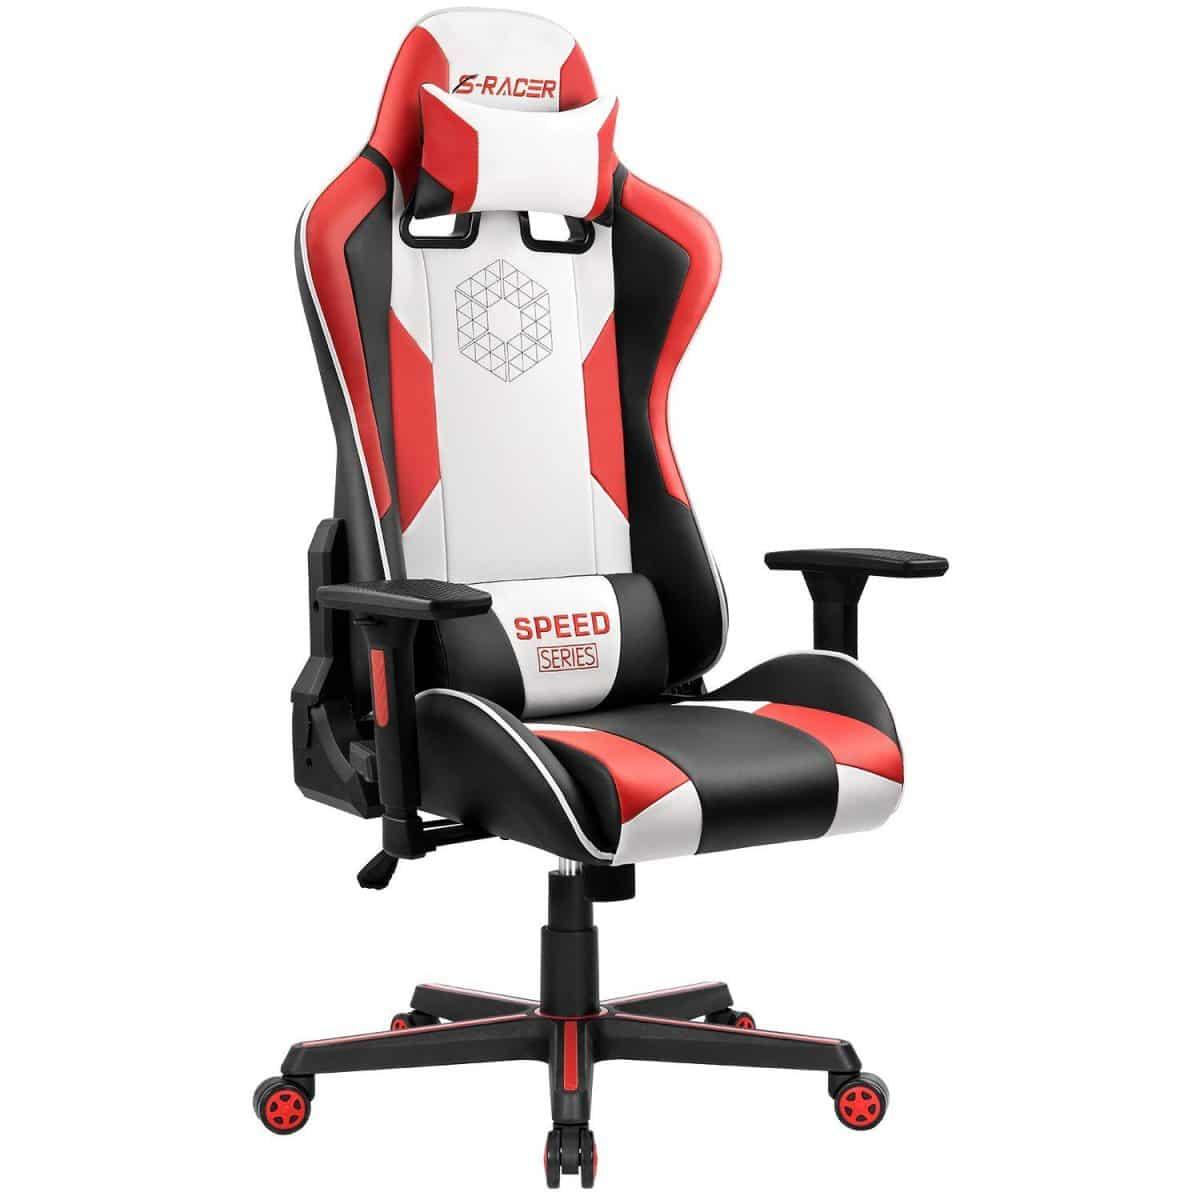 Pleasant Best Cheap Gaming Chairs 2019 Under 100 200 Budgetreport Ibusinesslaw Wood Chair Design Ideas Ibusinesslaworg